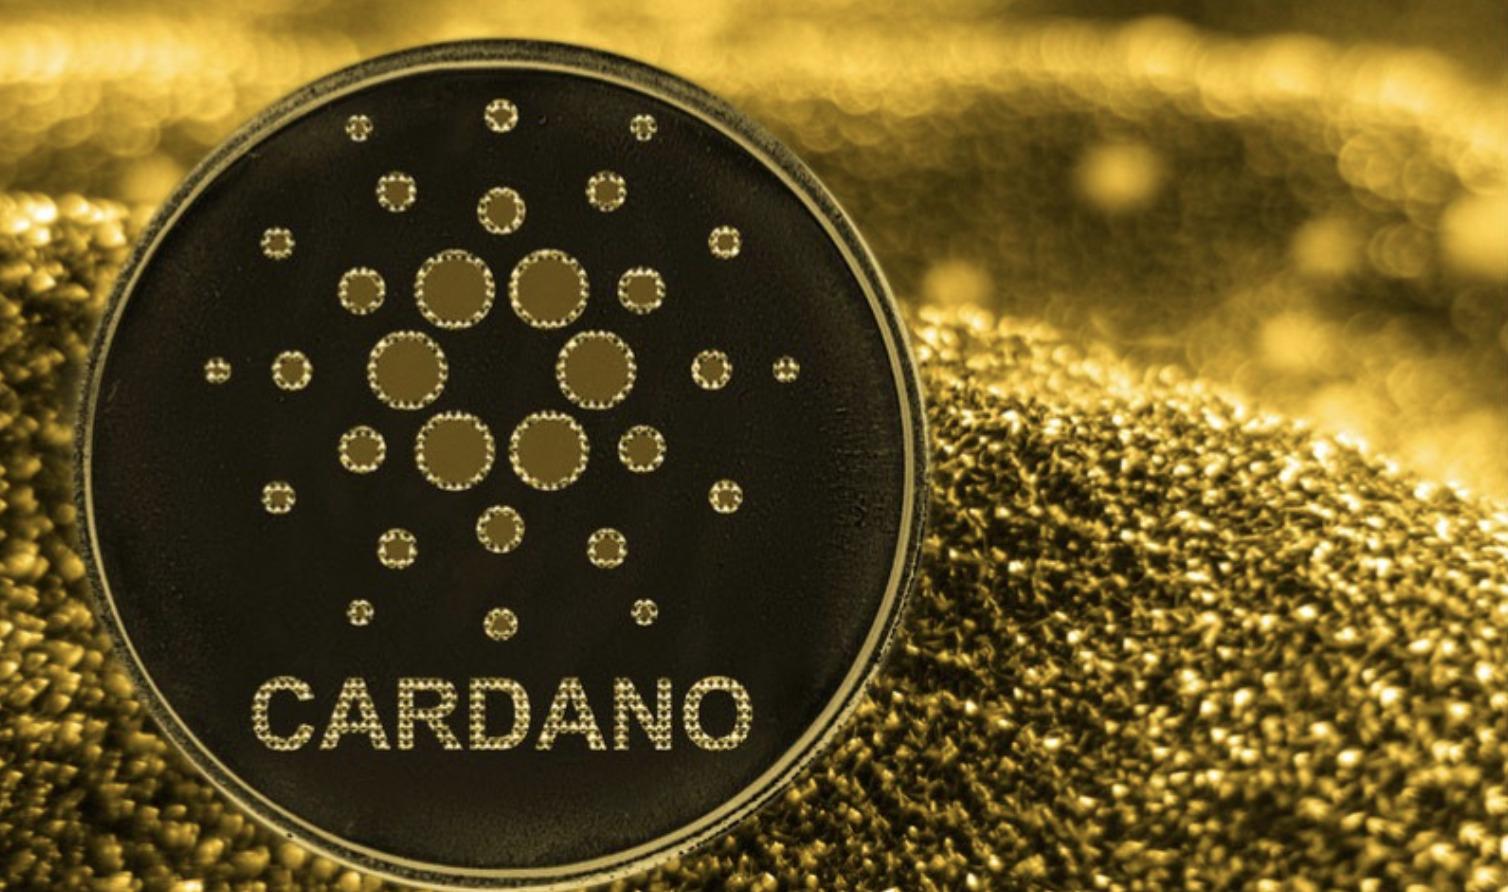 Cardano development progressing as expected